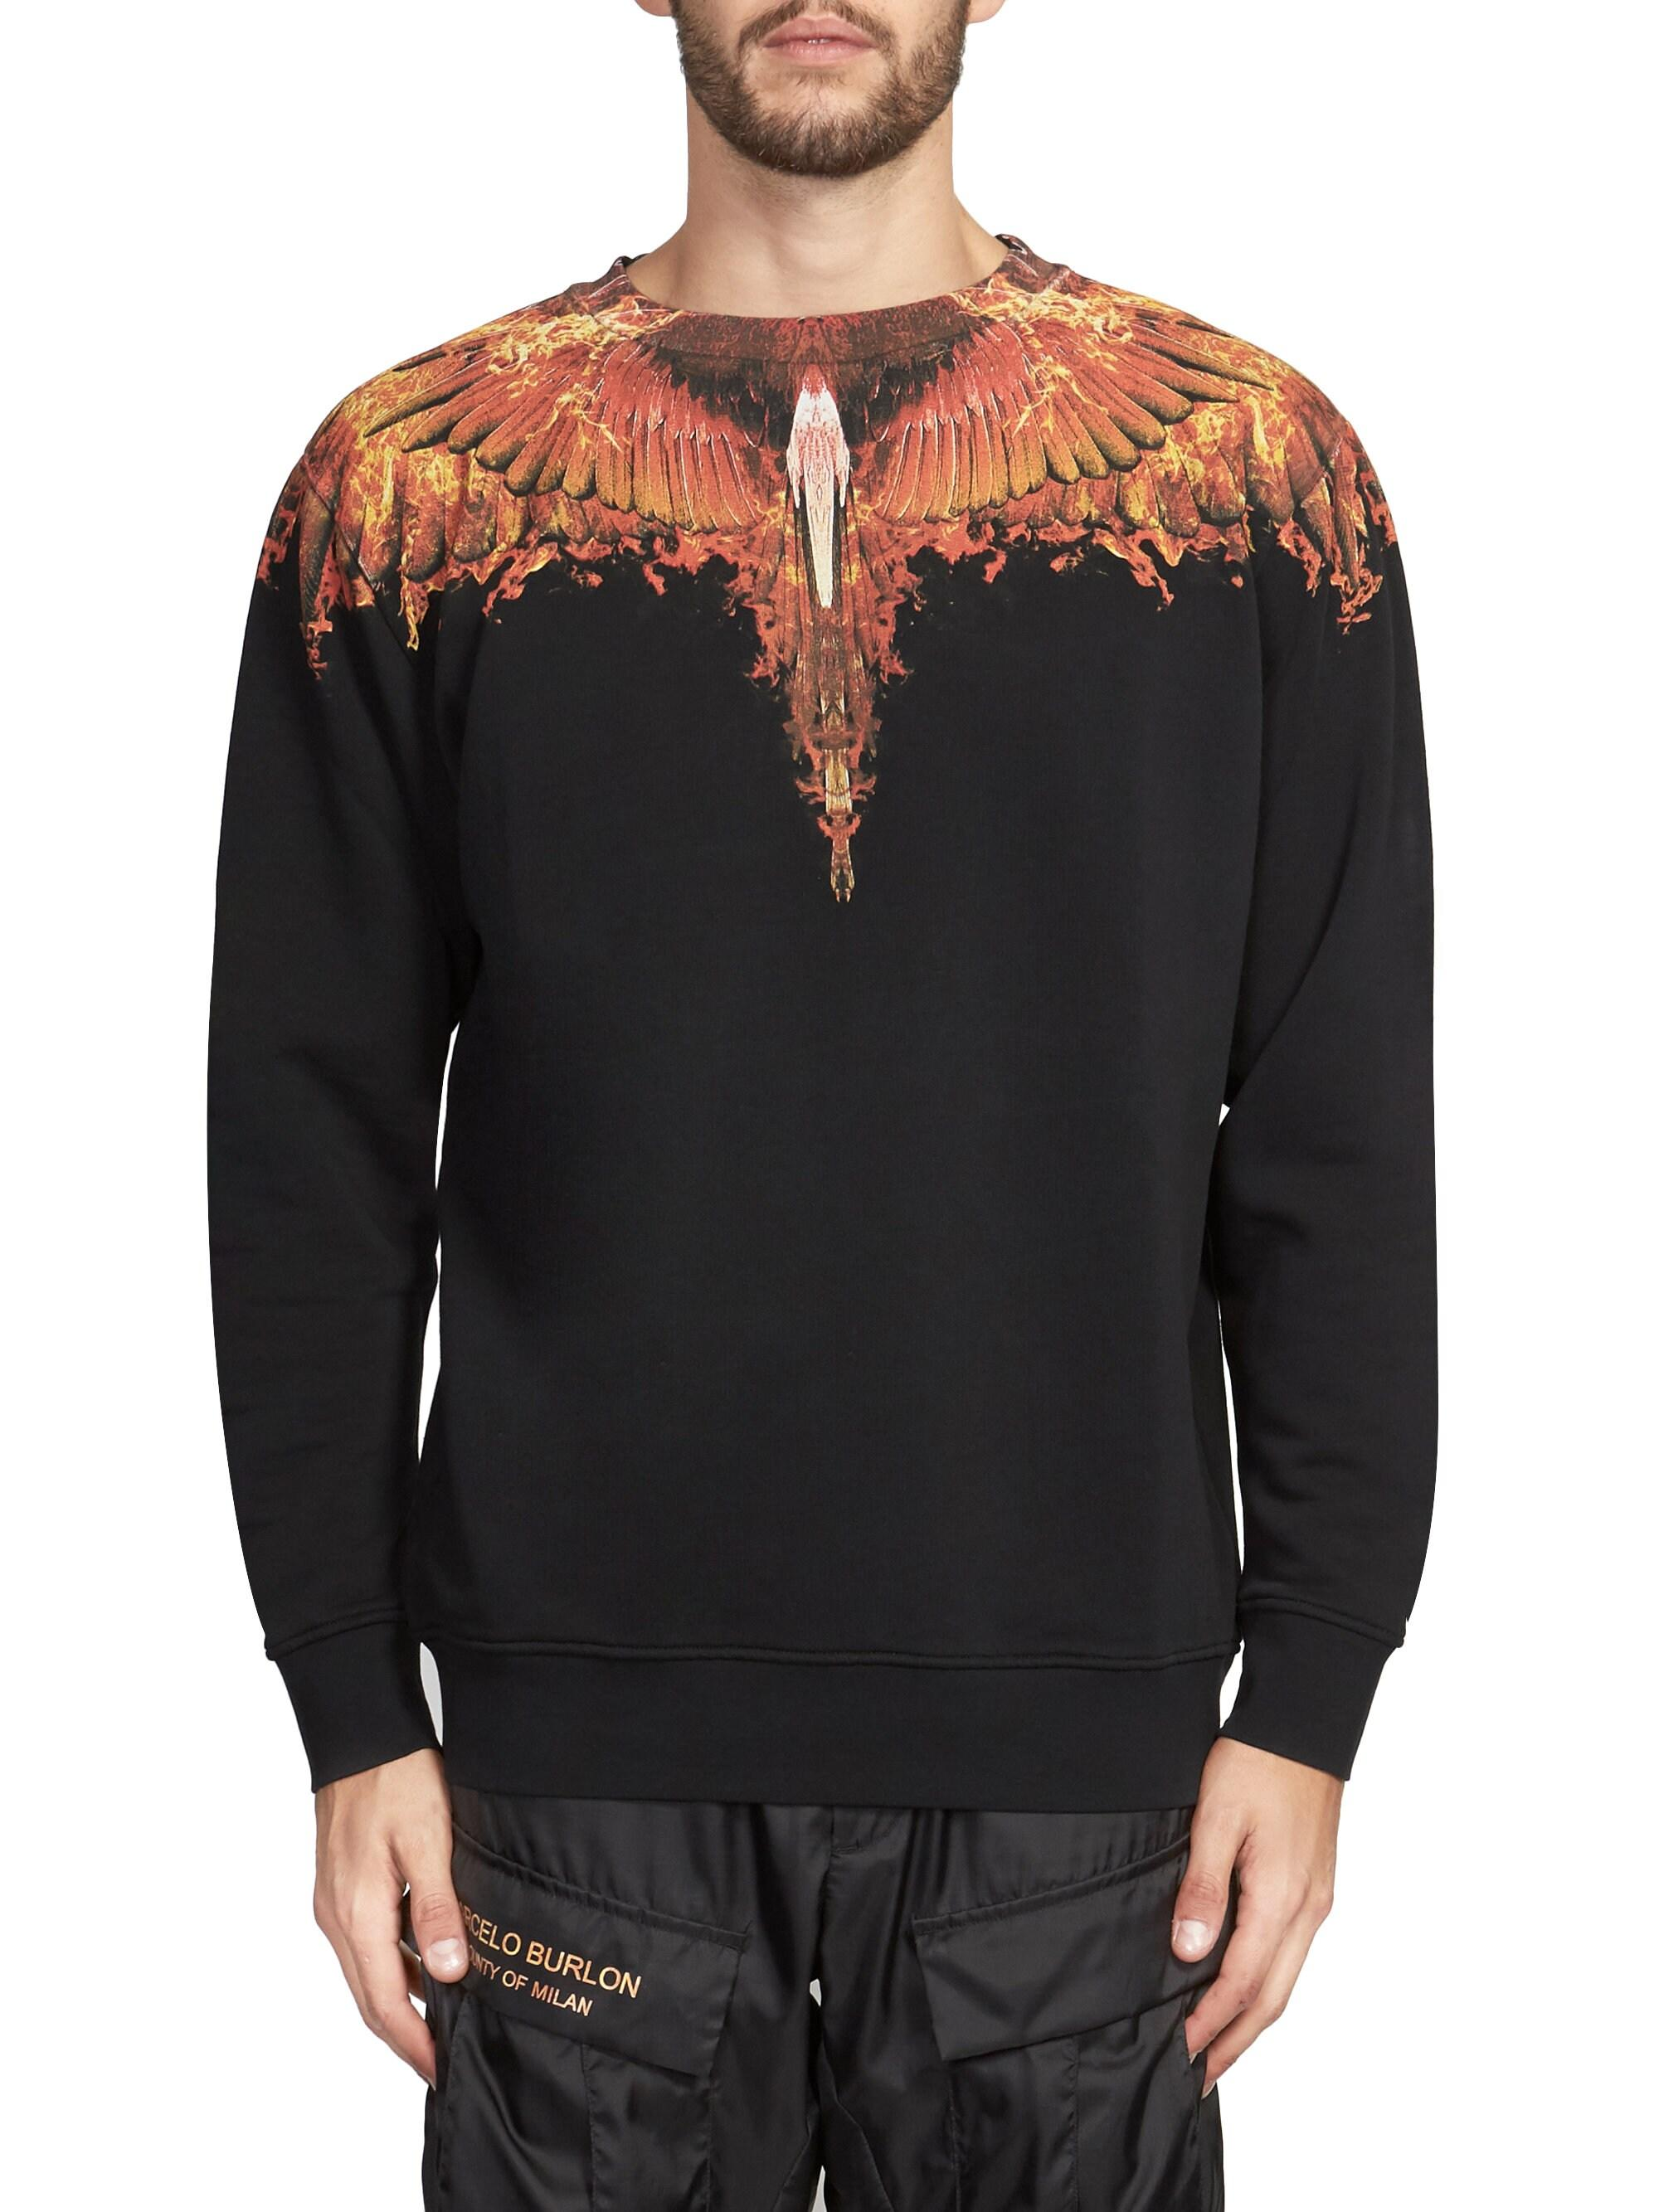 c283349f Marcelo Burlon Men's Flame Wing Cotton Sweatshirt - Black Multi in Black  for Men - Lyst